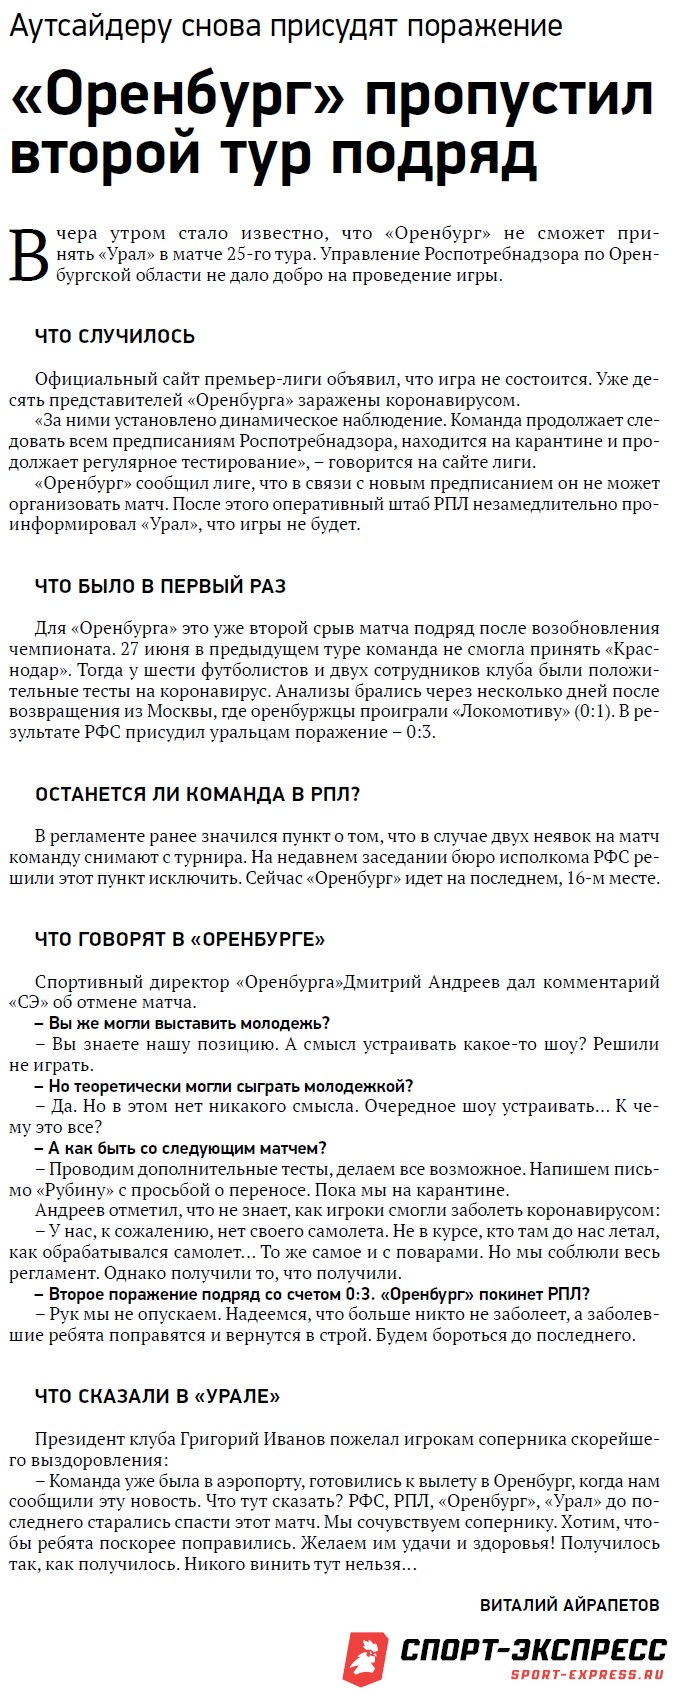 Оренбург (Оренбург) - Урал (Екатеринбург) -:+ тех.